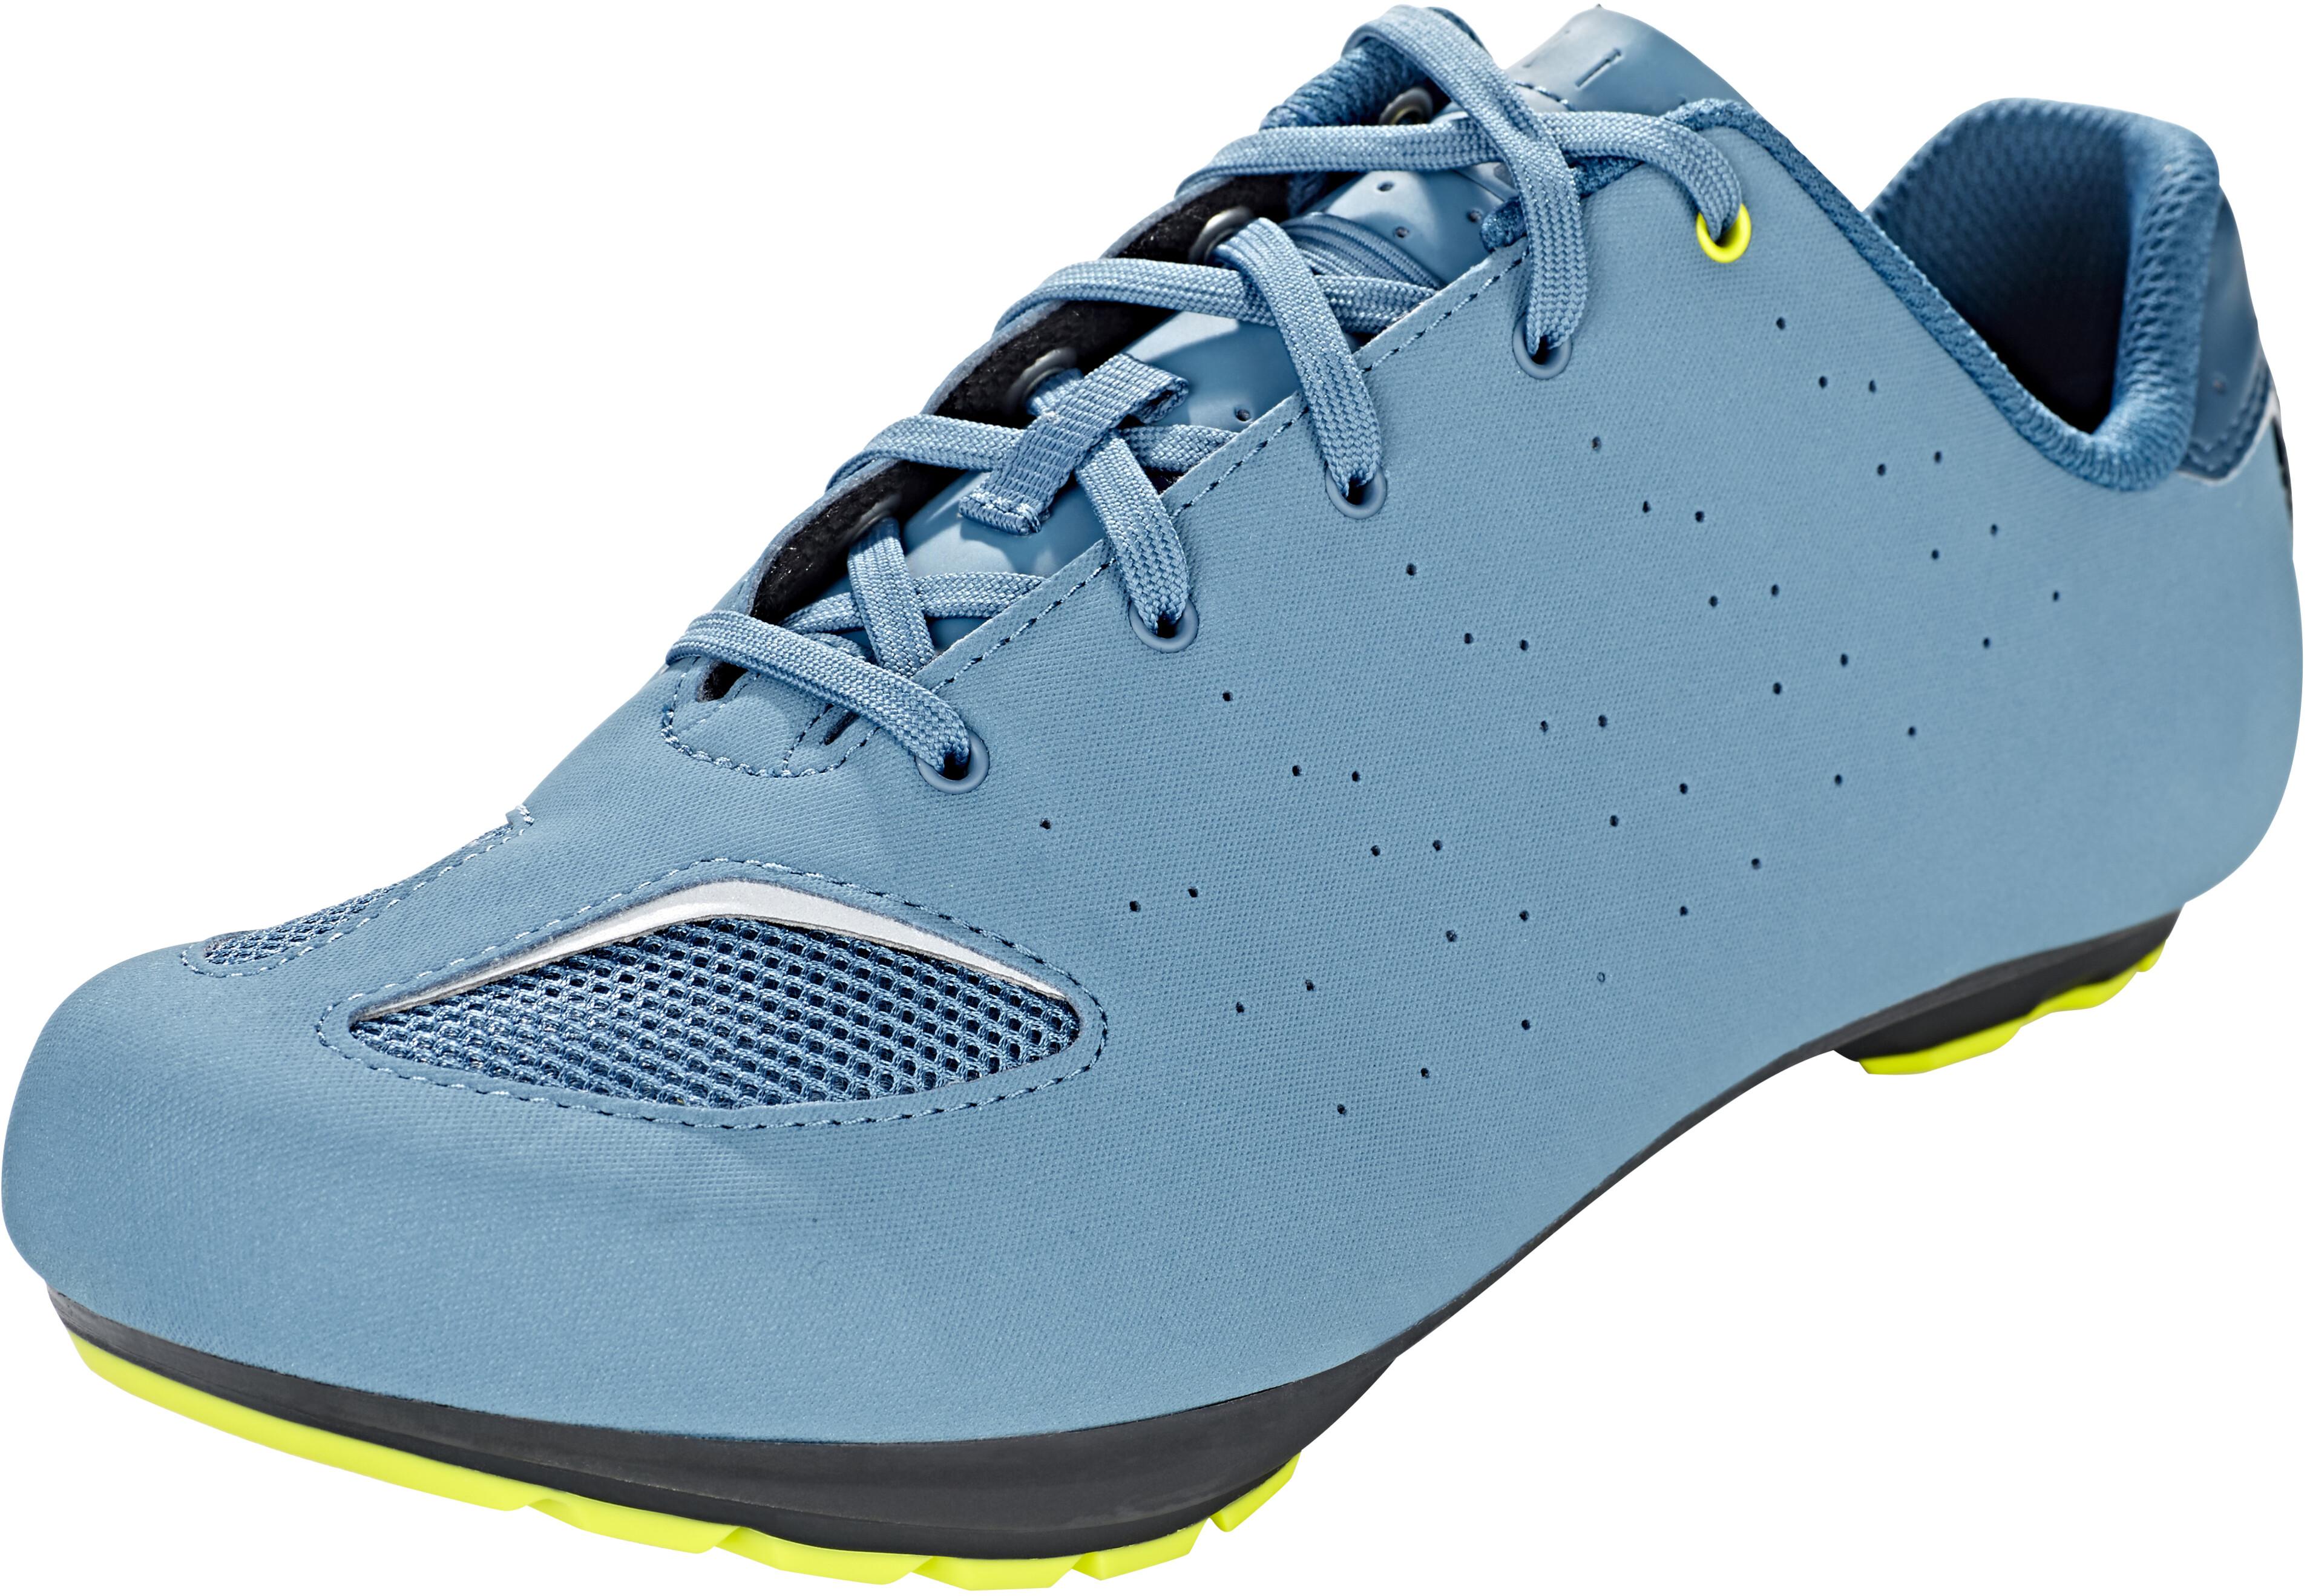 bc605644 Mavic Allroad Elite Buty Mężczyźni, teal/majolica blue/sulphur ...